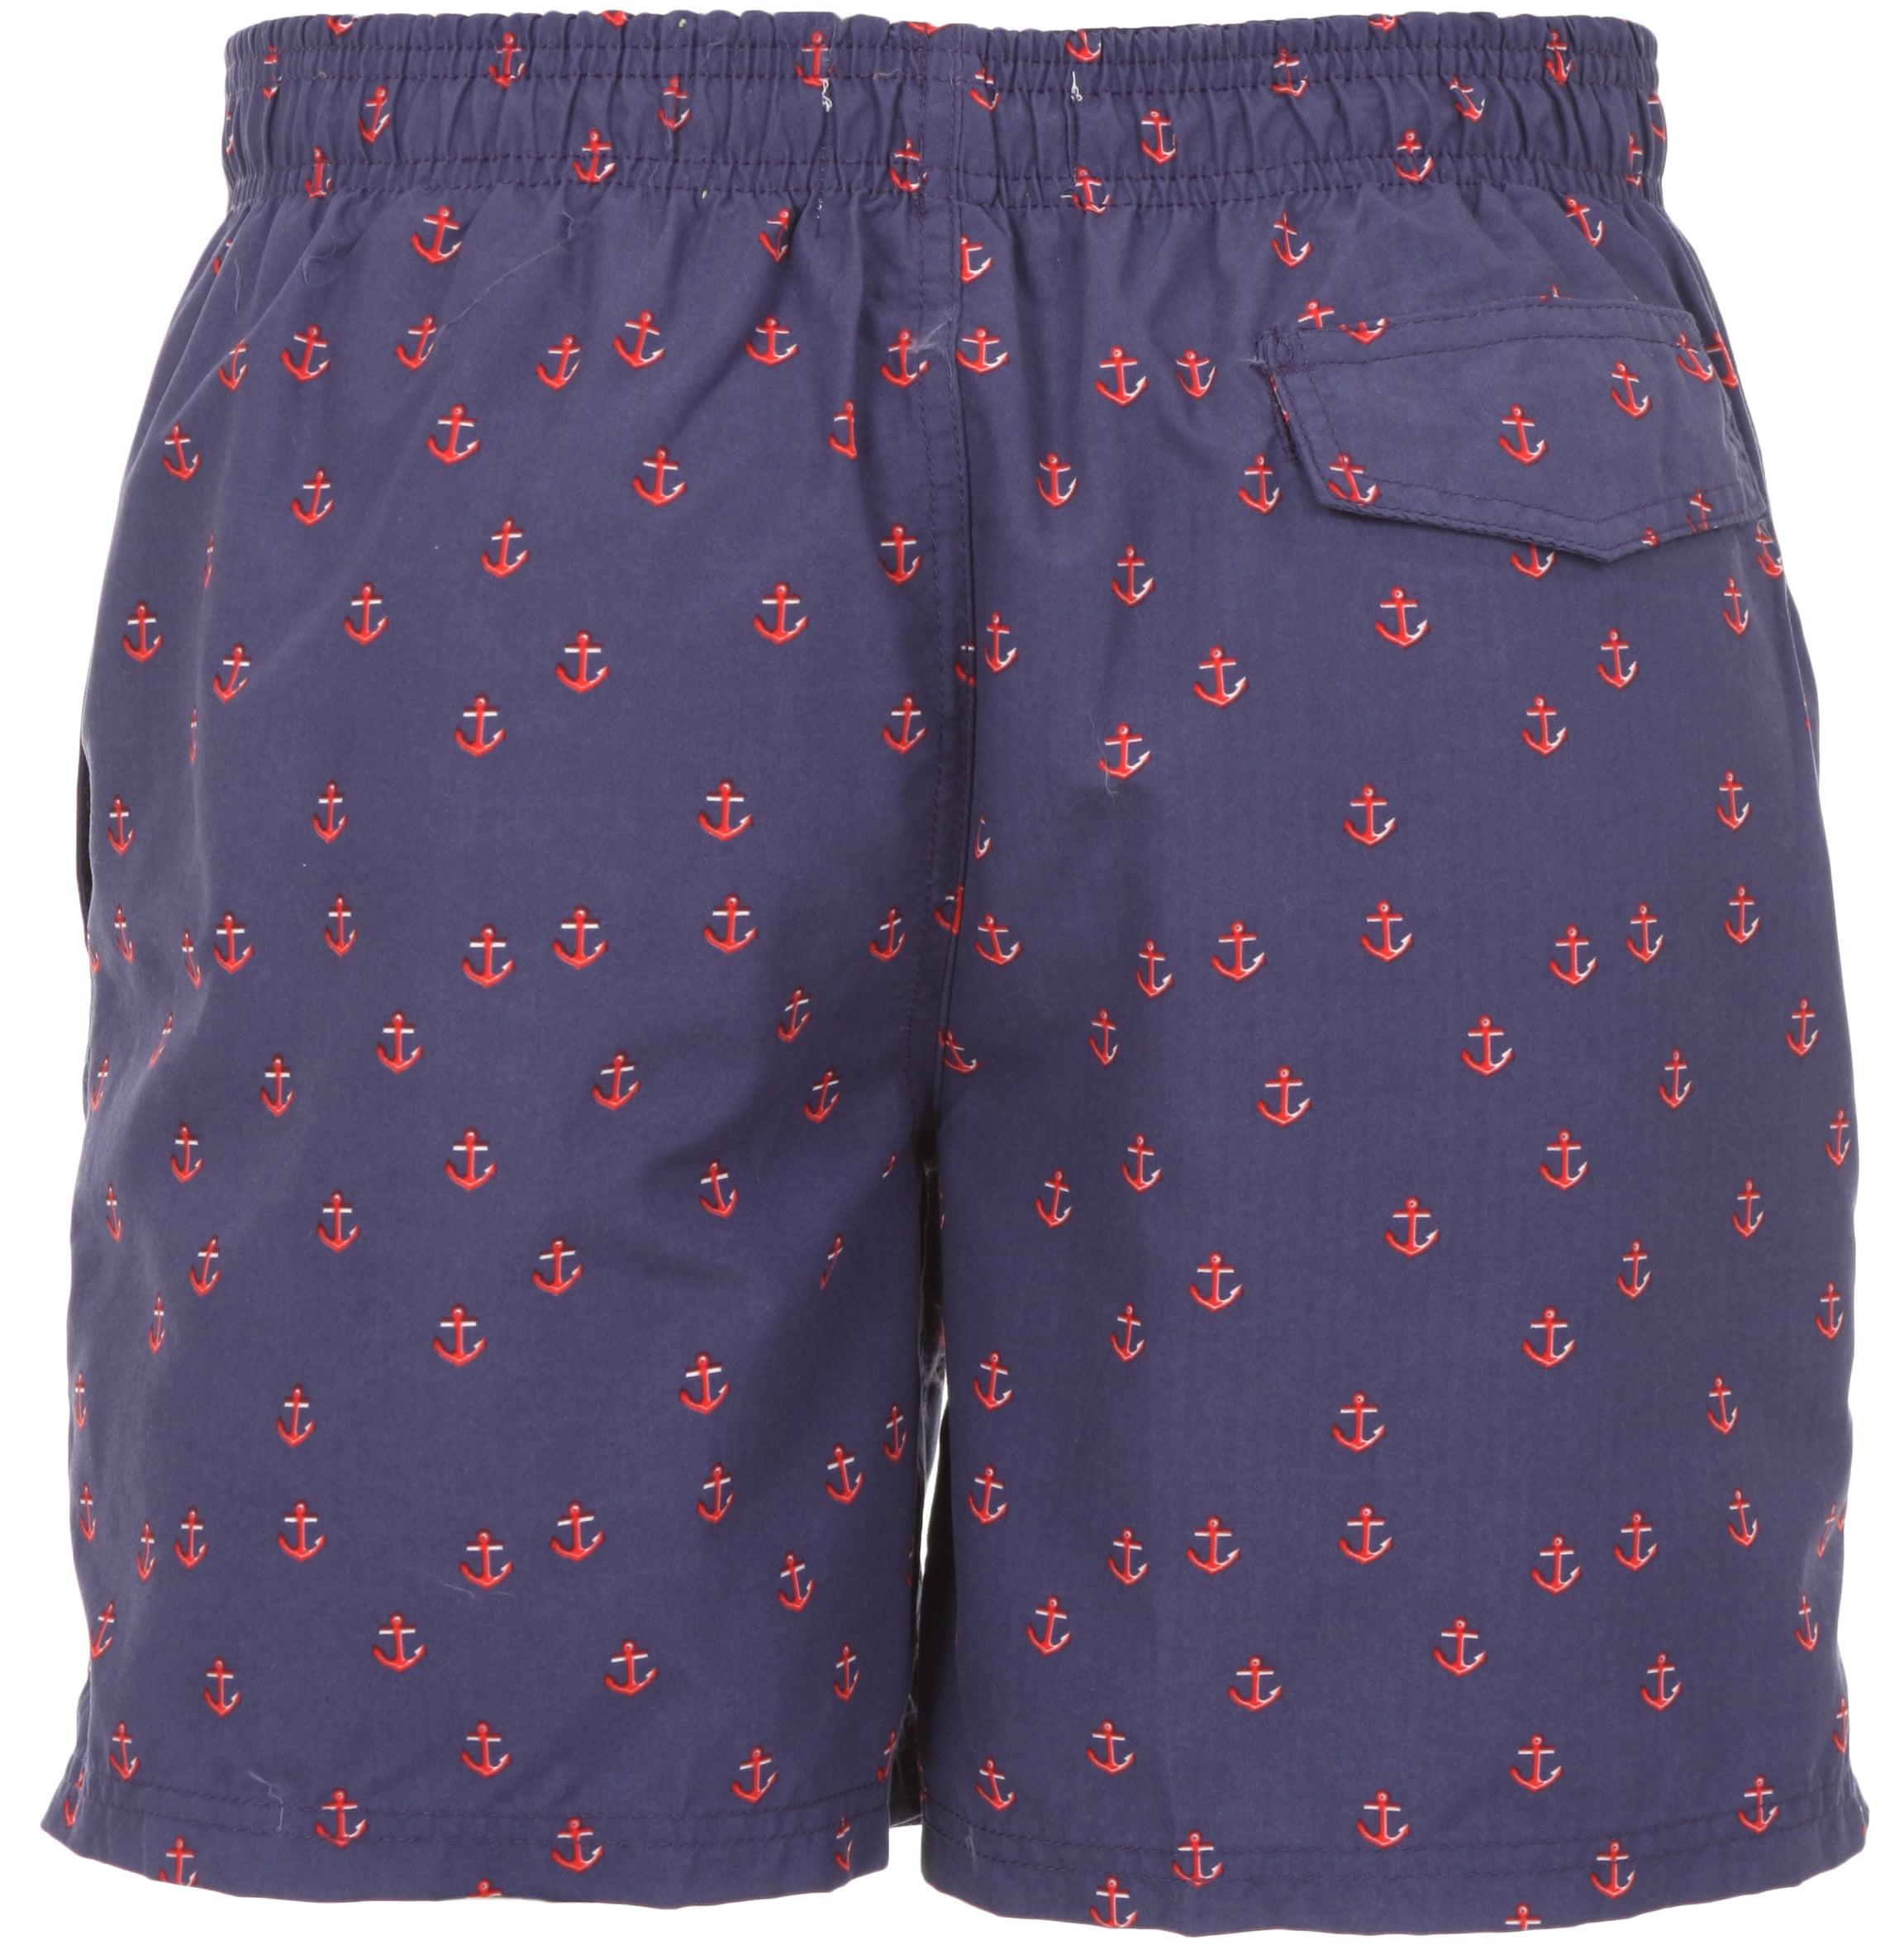 Sailor Guinea Pigs Mens Beach Shorts Swim Trunks Outdoor Shorts Running Shorts